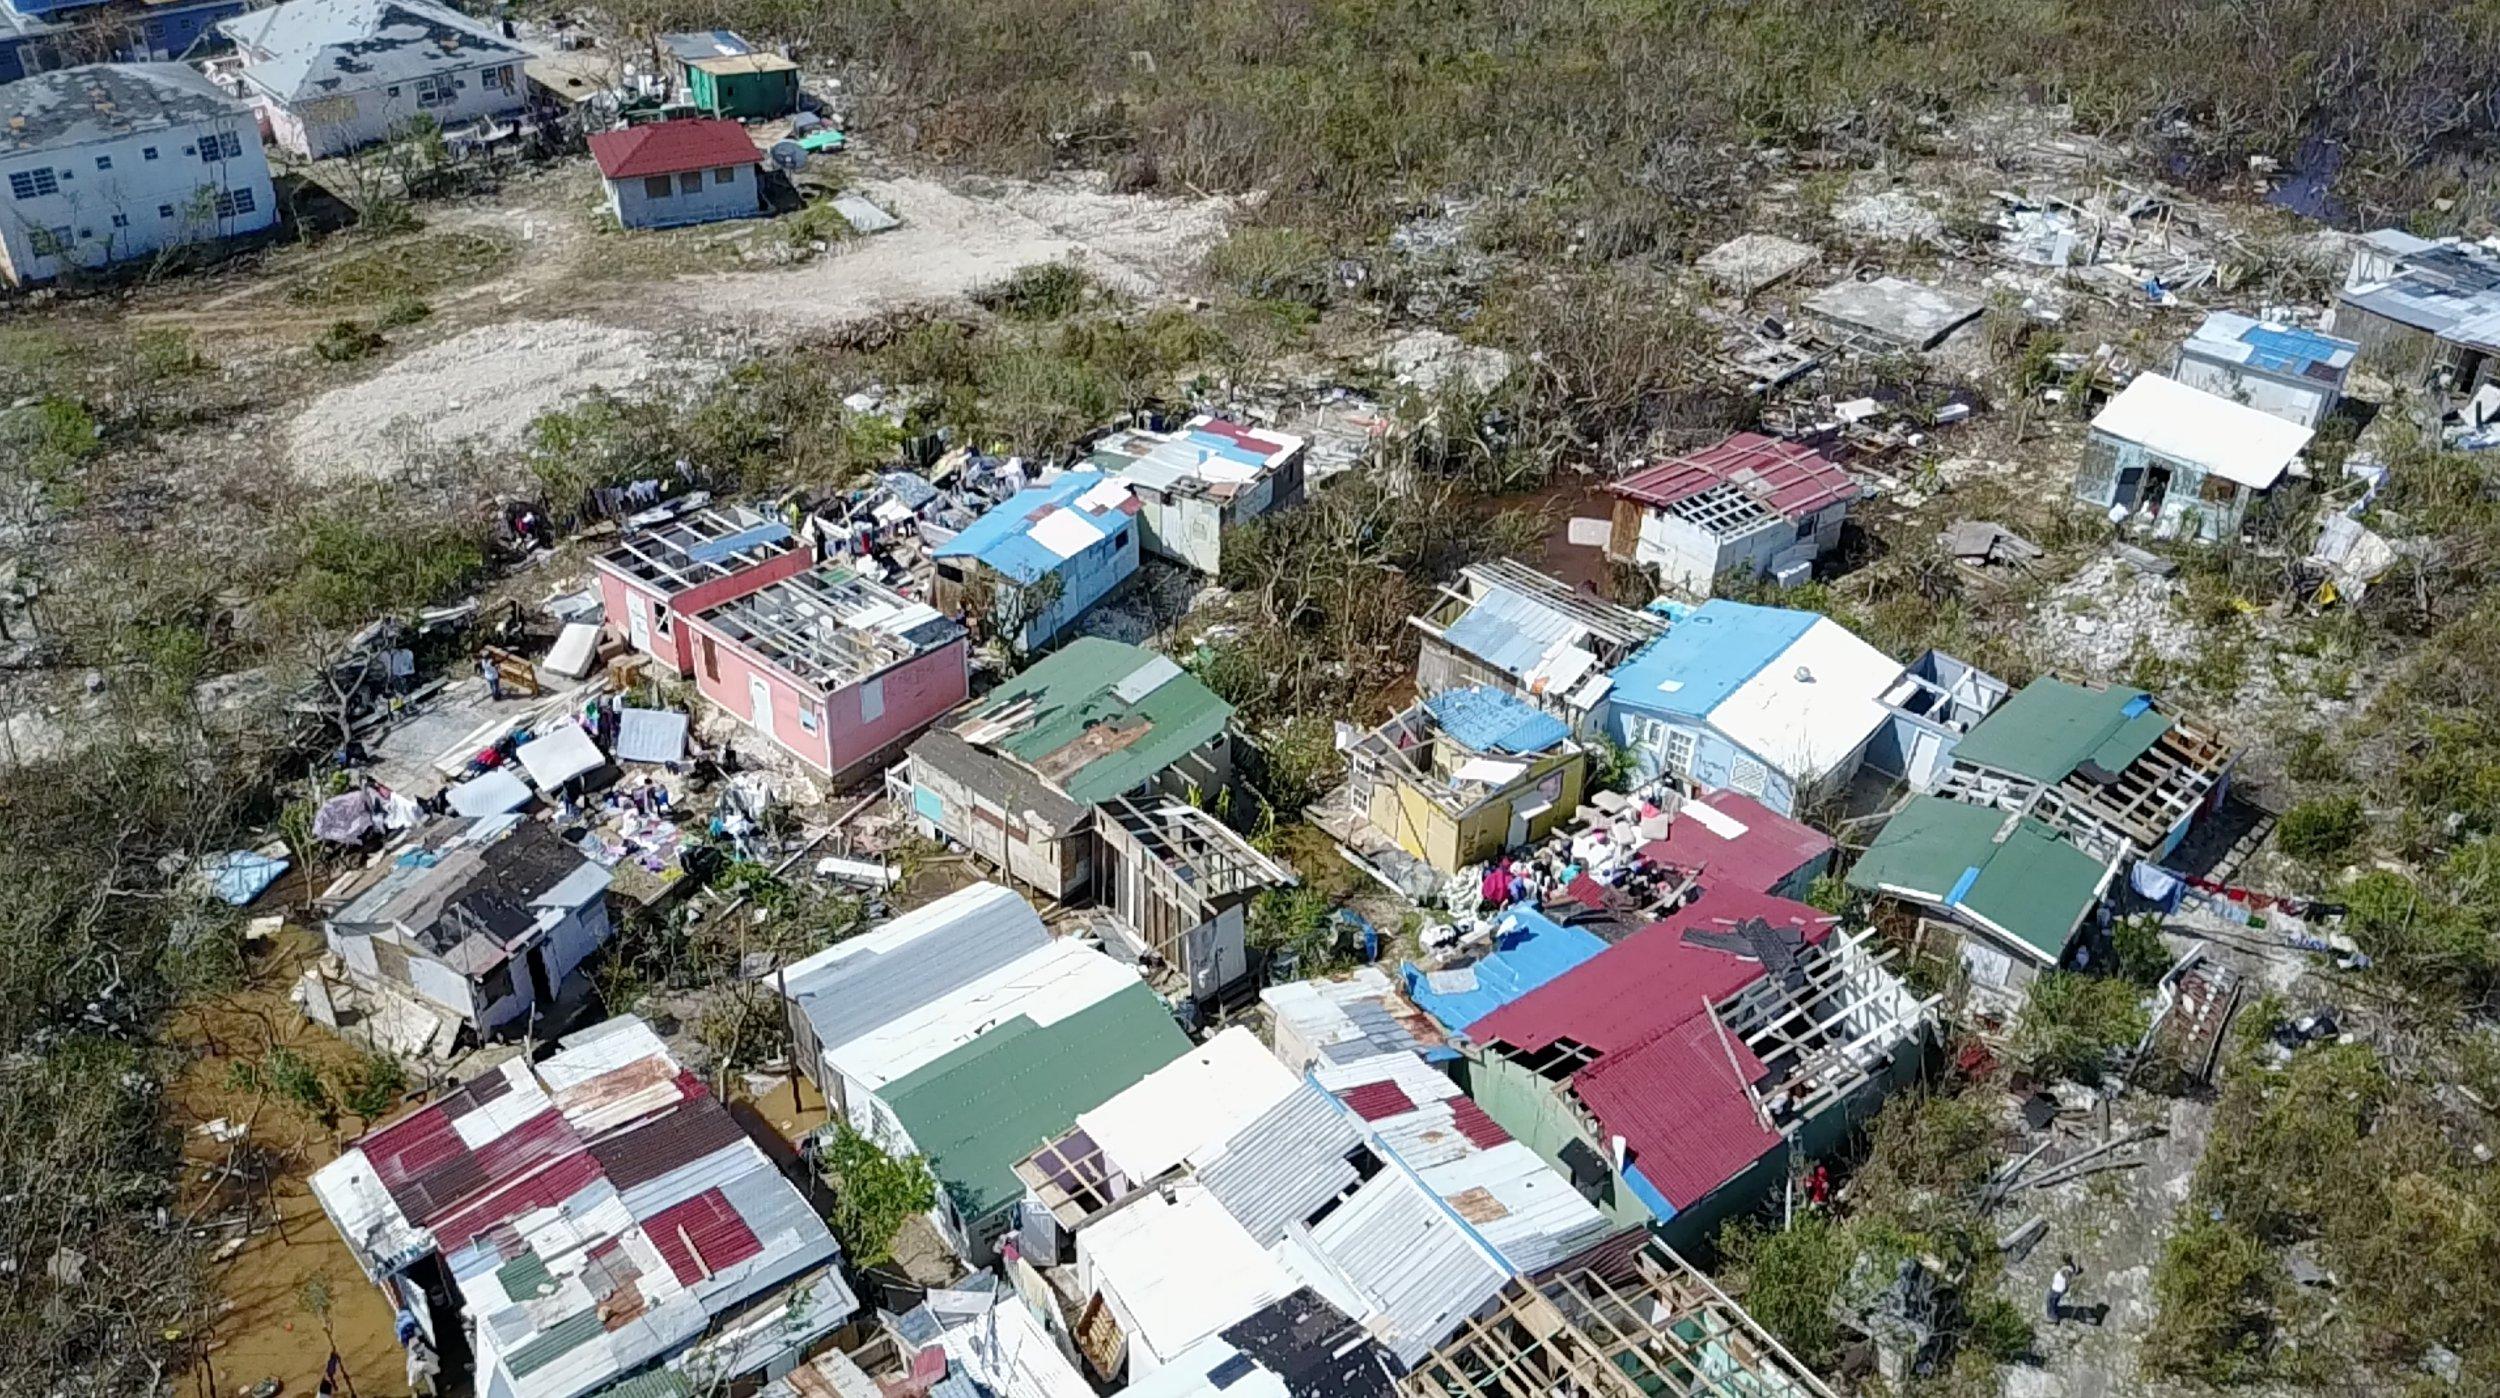 Islanders still reeling from Irma devastation now brace for Hurricane Maria